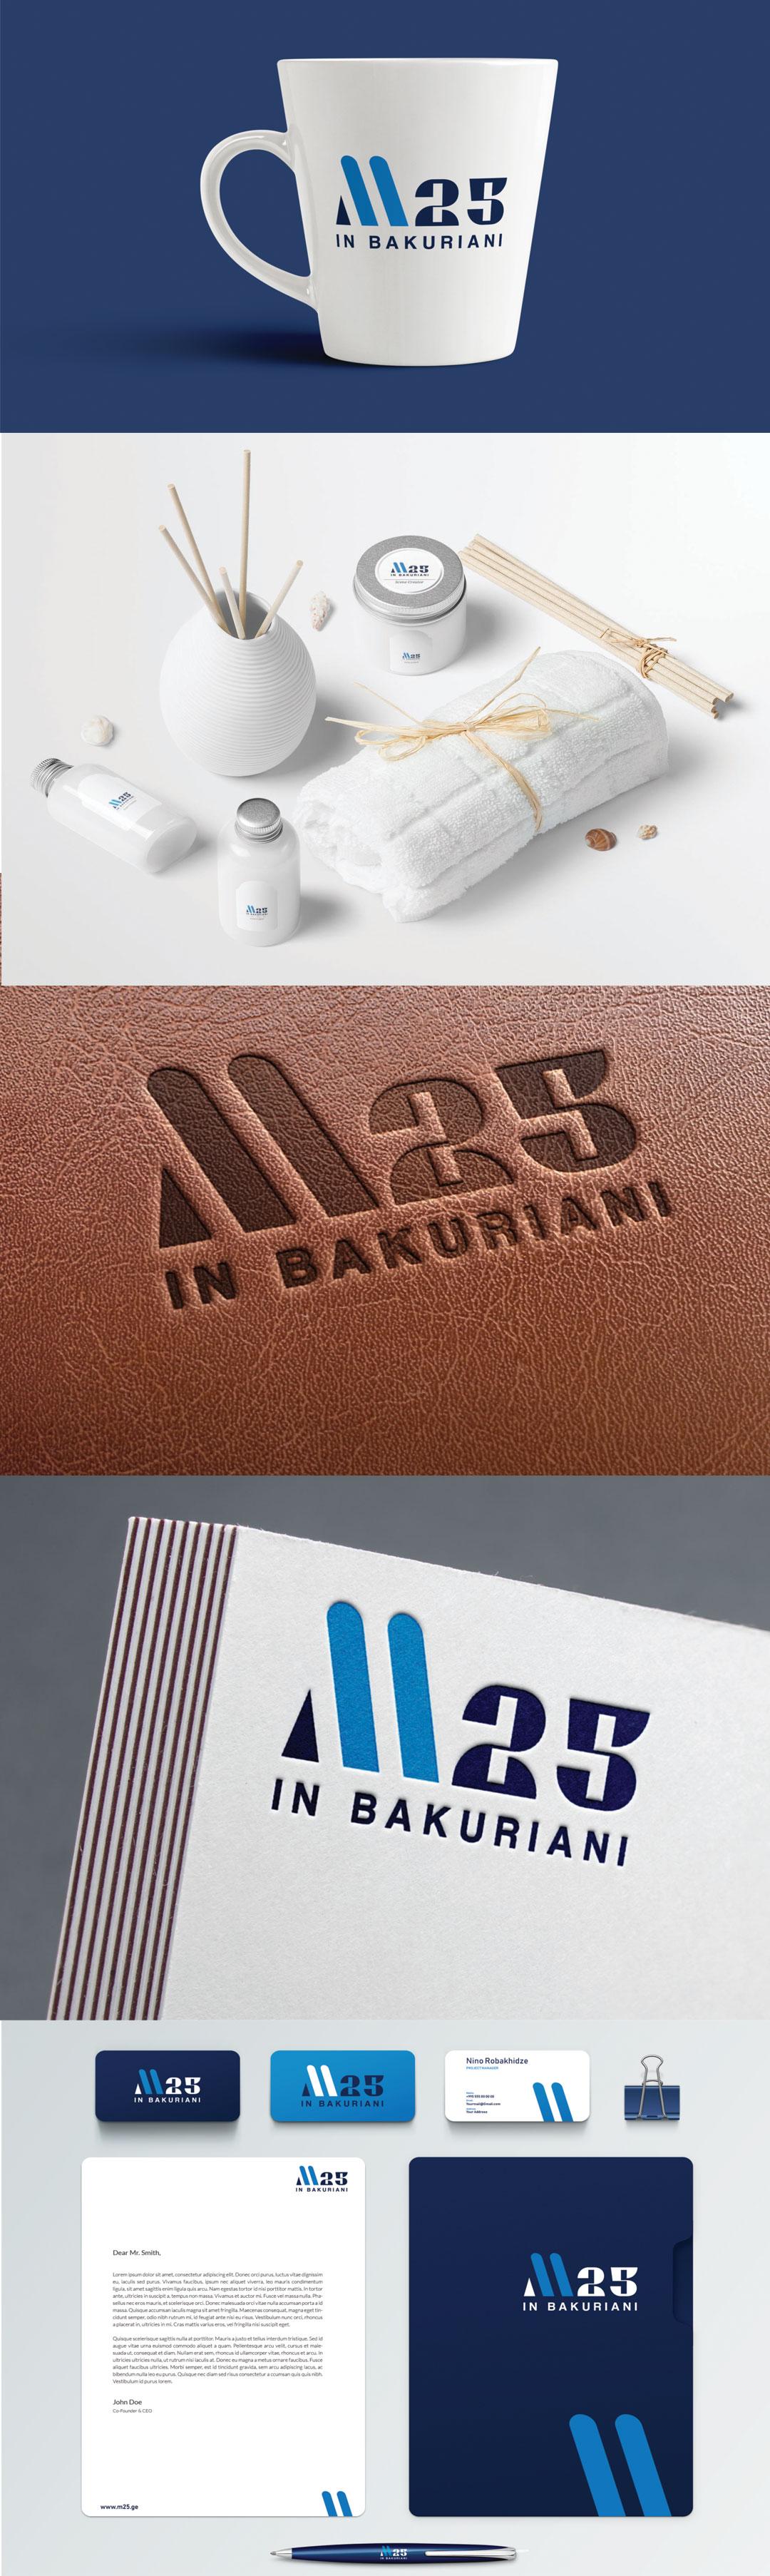 M25 in Bakuriani